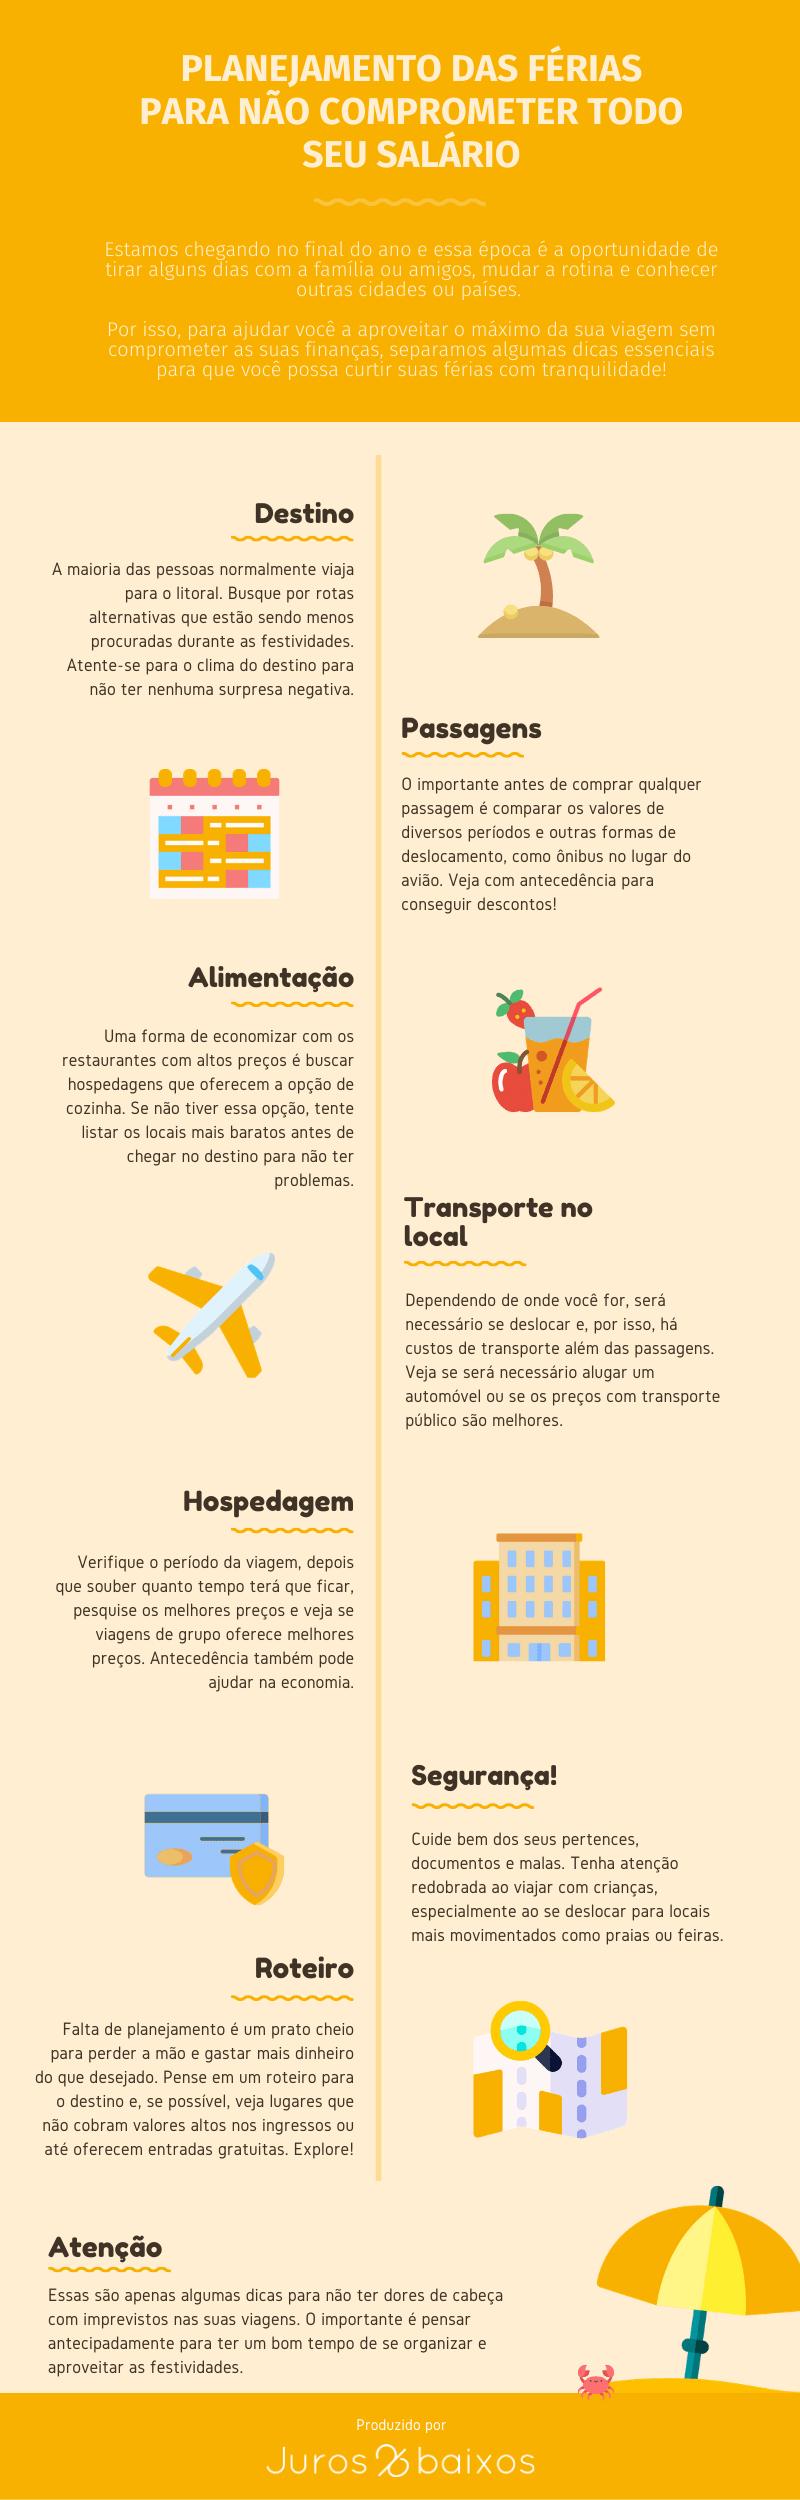 Infográfico Juros Baixos